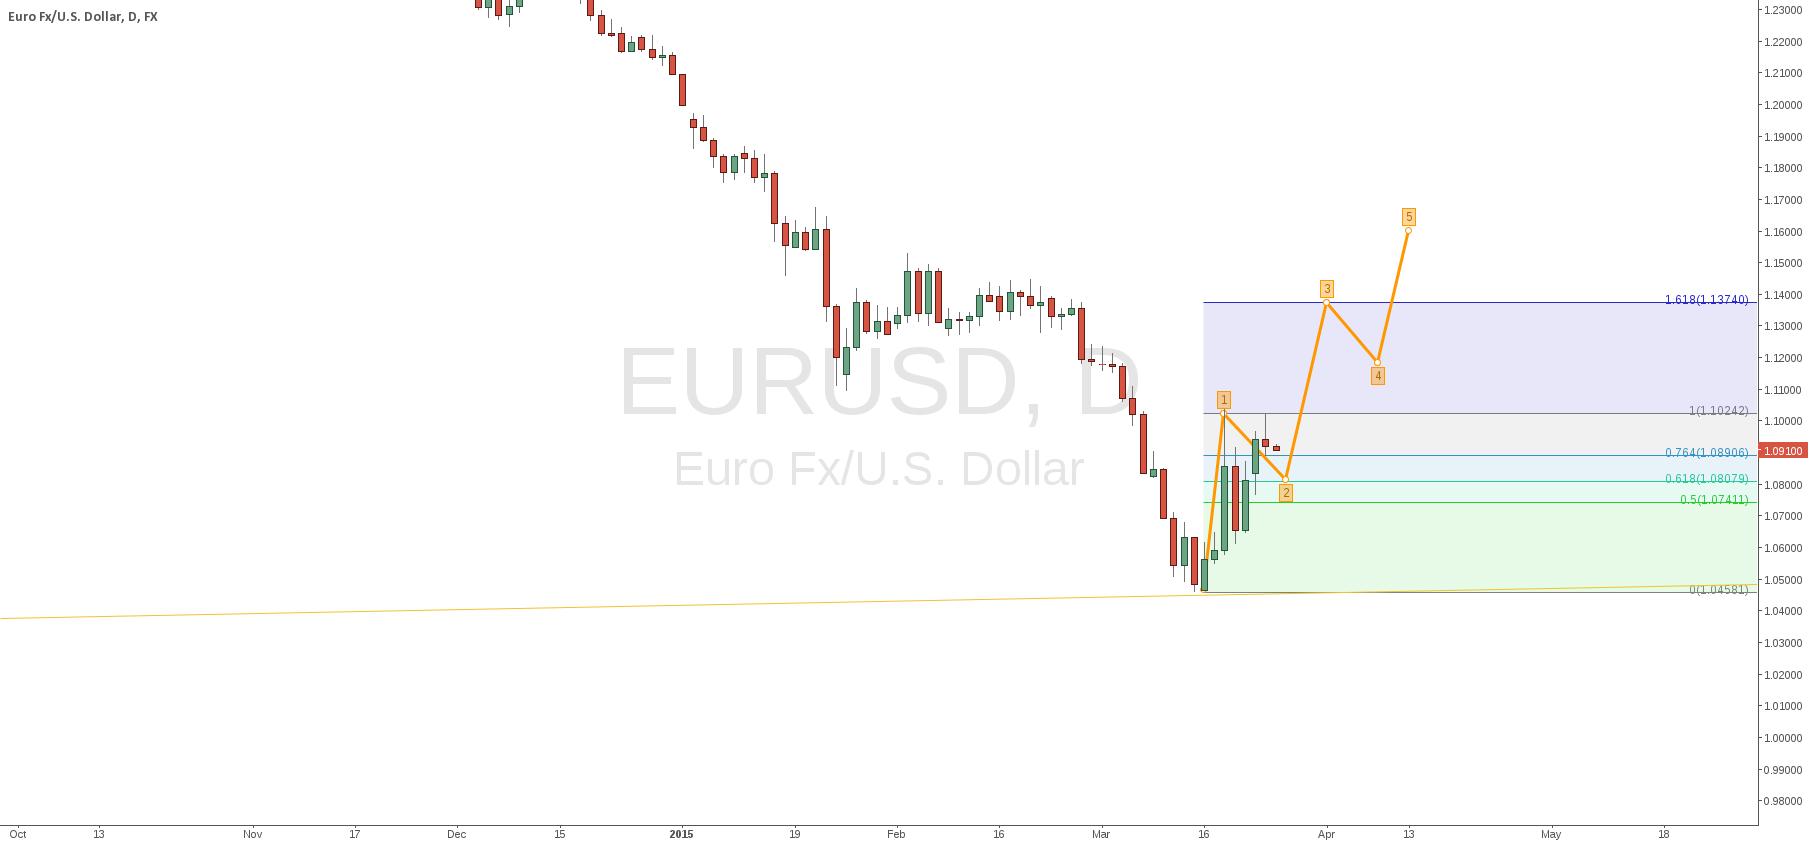 EURUSD short, then long